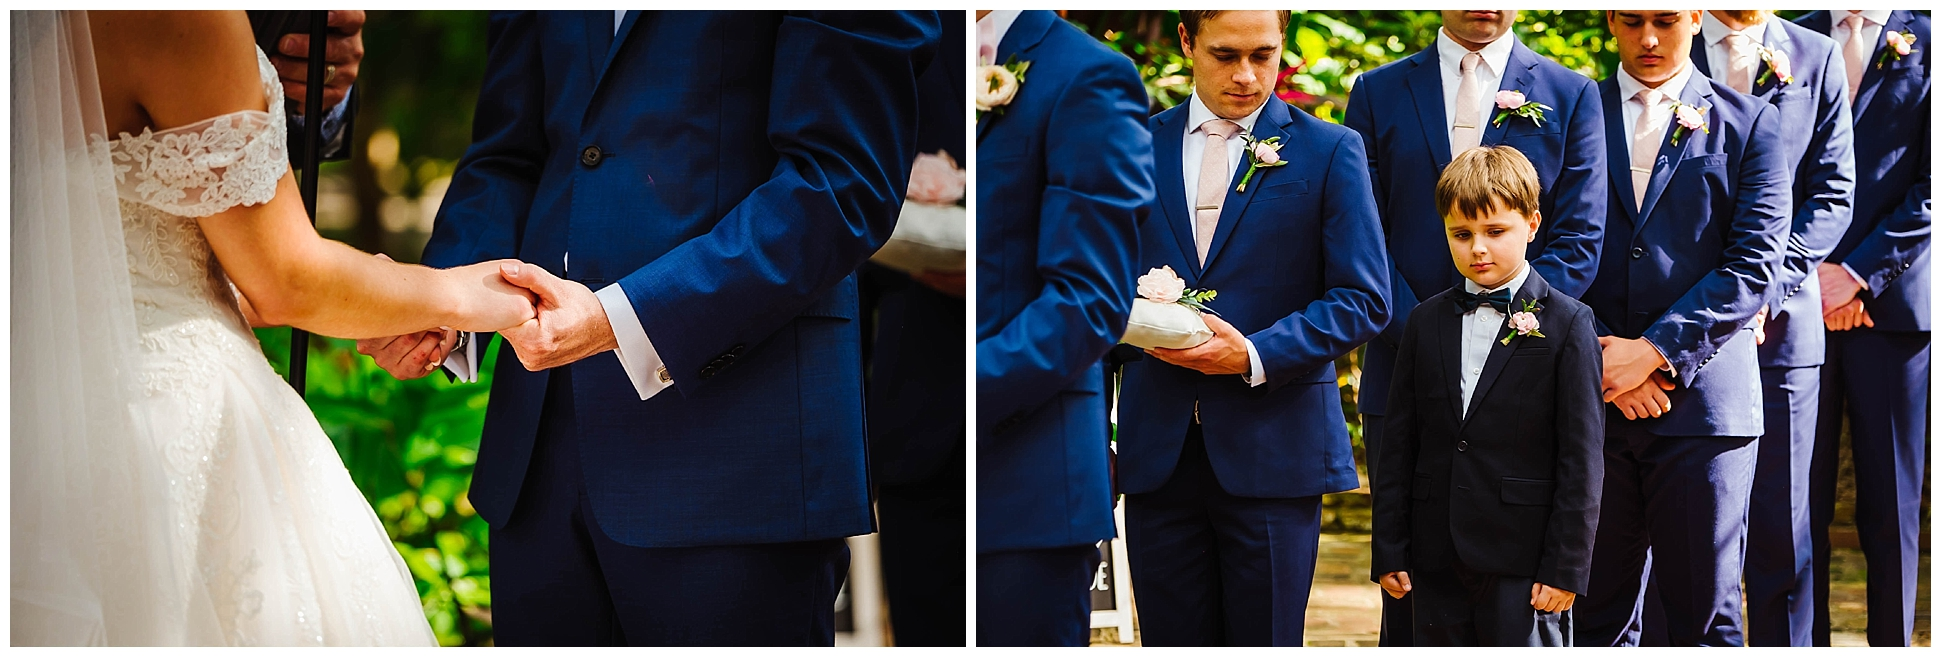 st-pete-wedding-photographer-sunken-gardens-crystal-ballroom-princess-dancer_0151.jpg